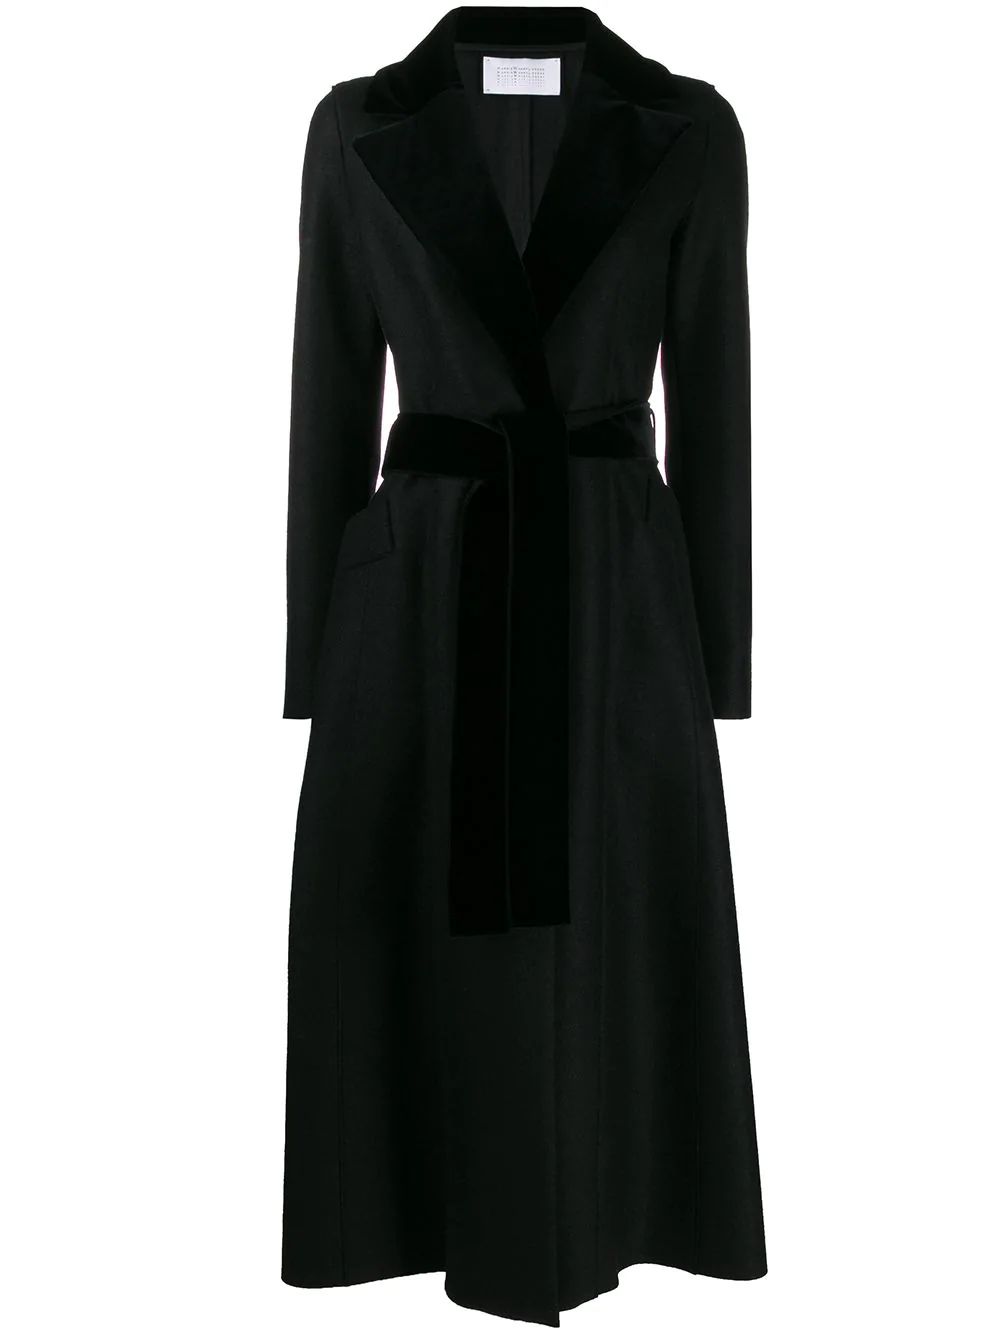 Harris Wharf London Long Belted Coat Farfetch Womens Dress Coats Coat Dress Wool Coat Women [ 1334 x 1000 Pixel ]